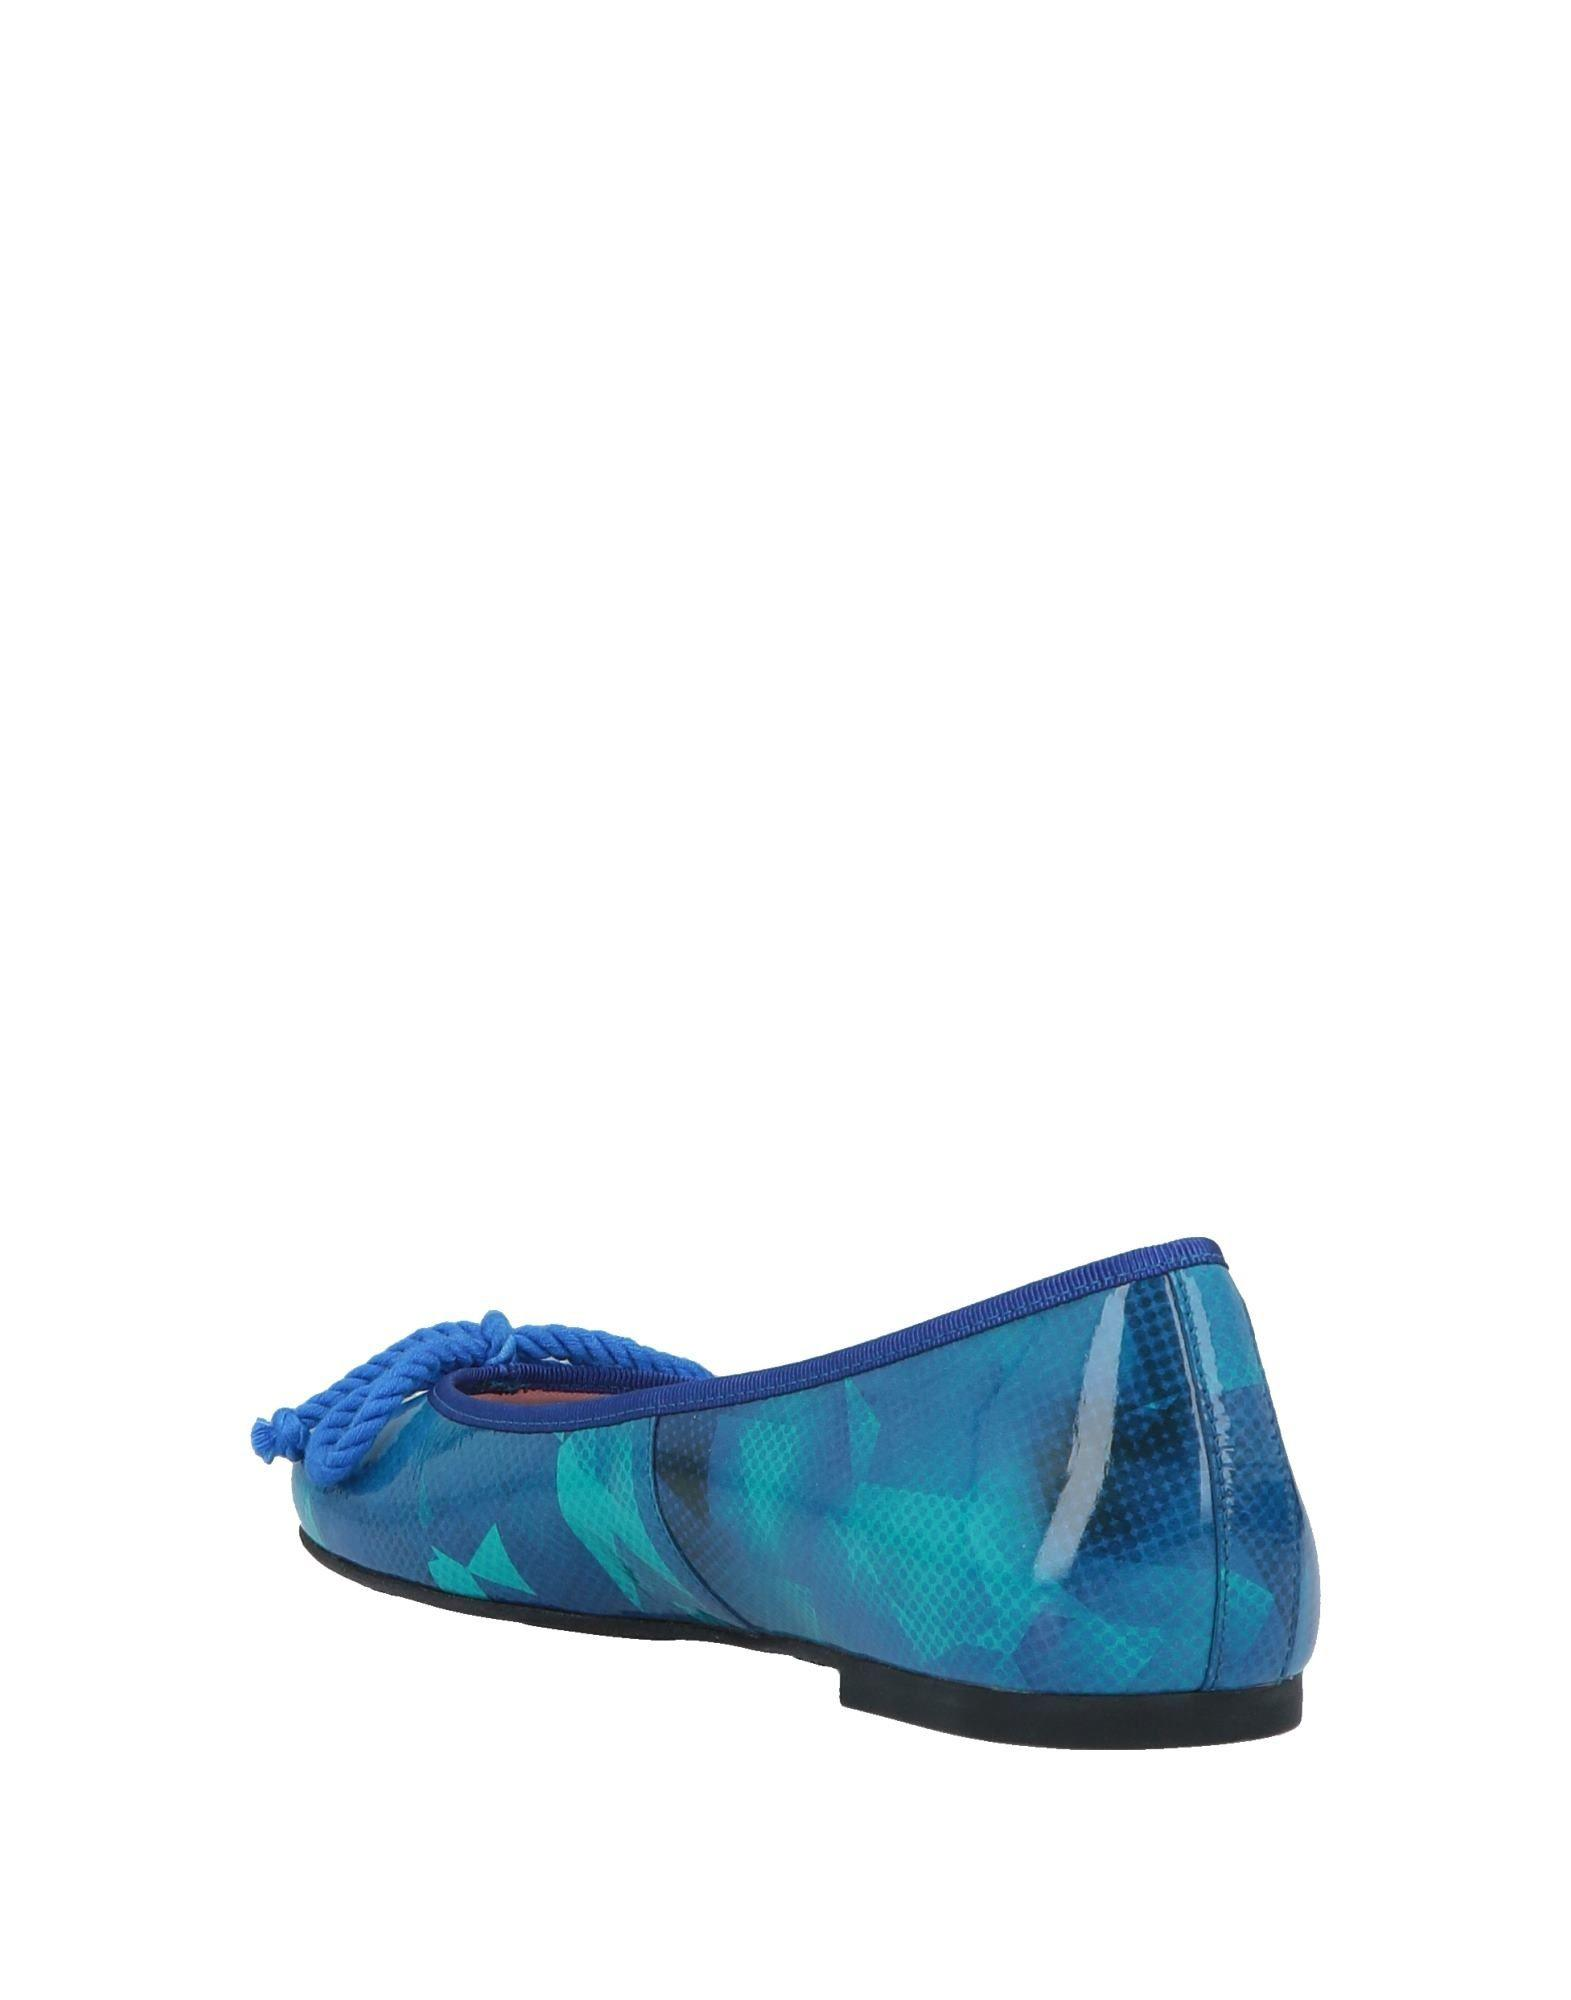 e3c7c1dd5ca Lyst - Pretty Ballerinas Ballet Flats in Blue